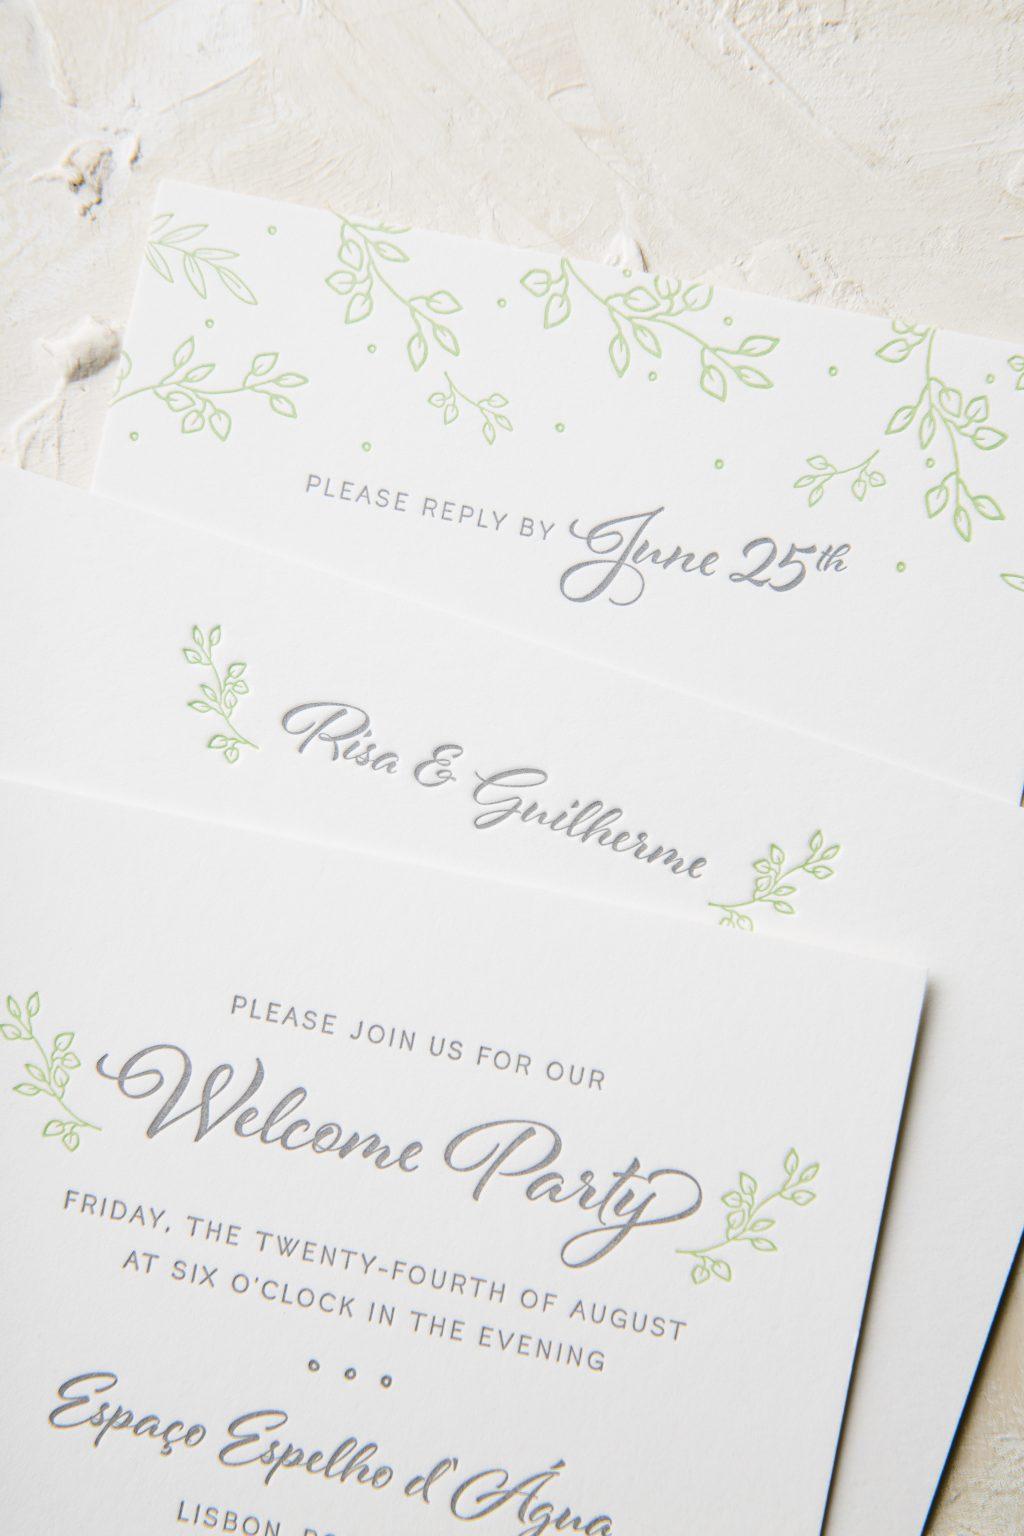 Botanical letterpress wedding invitations in Pewter